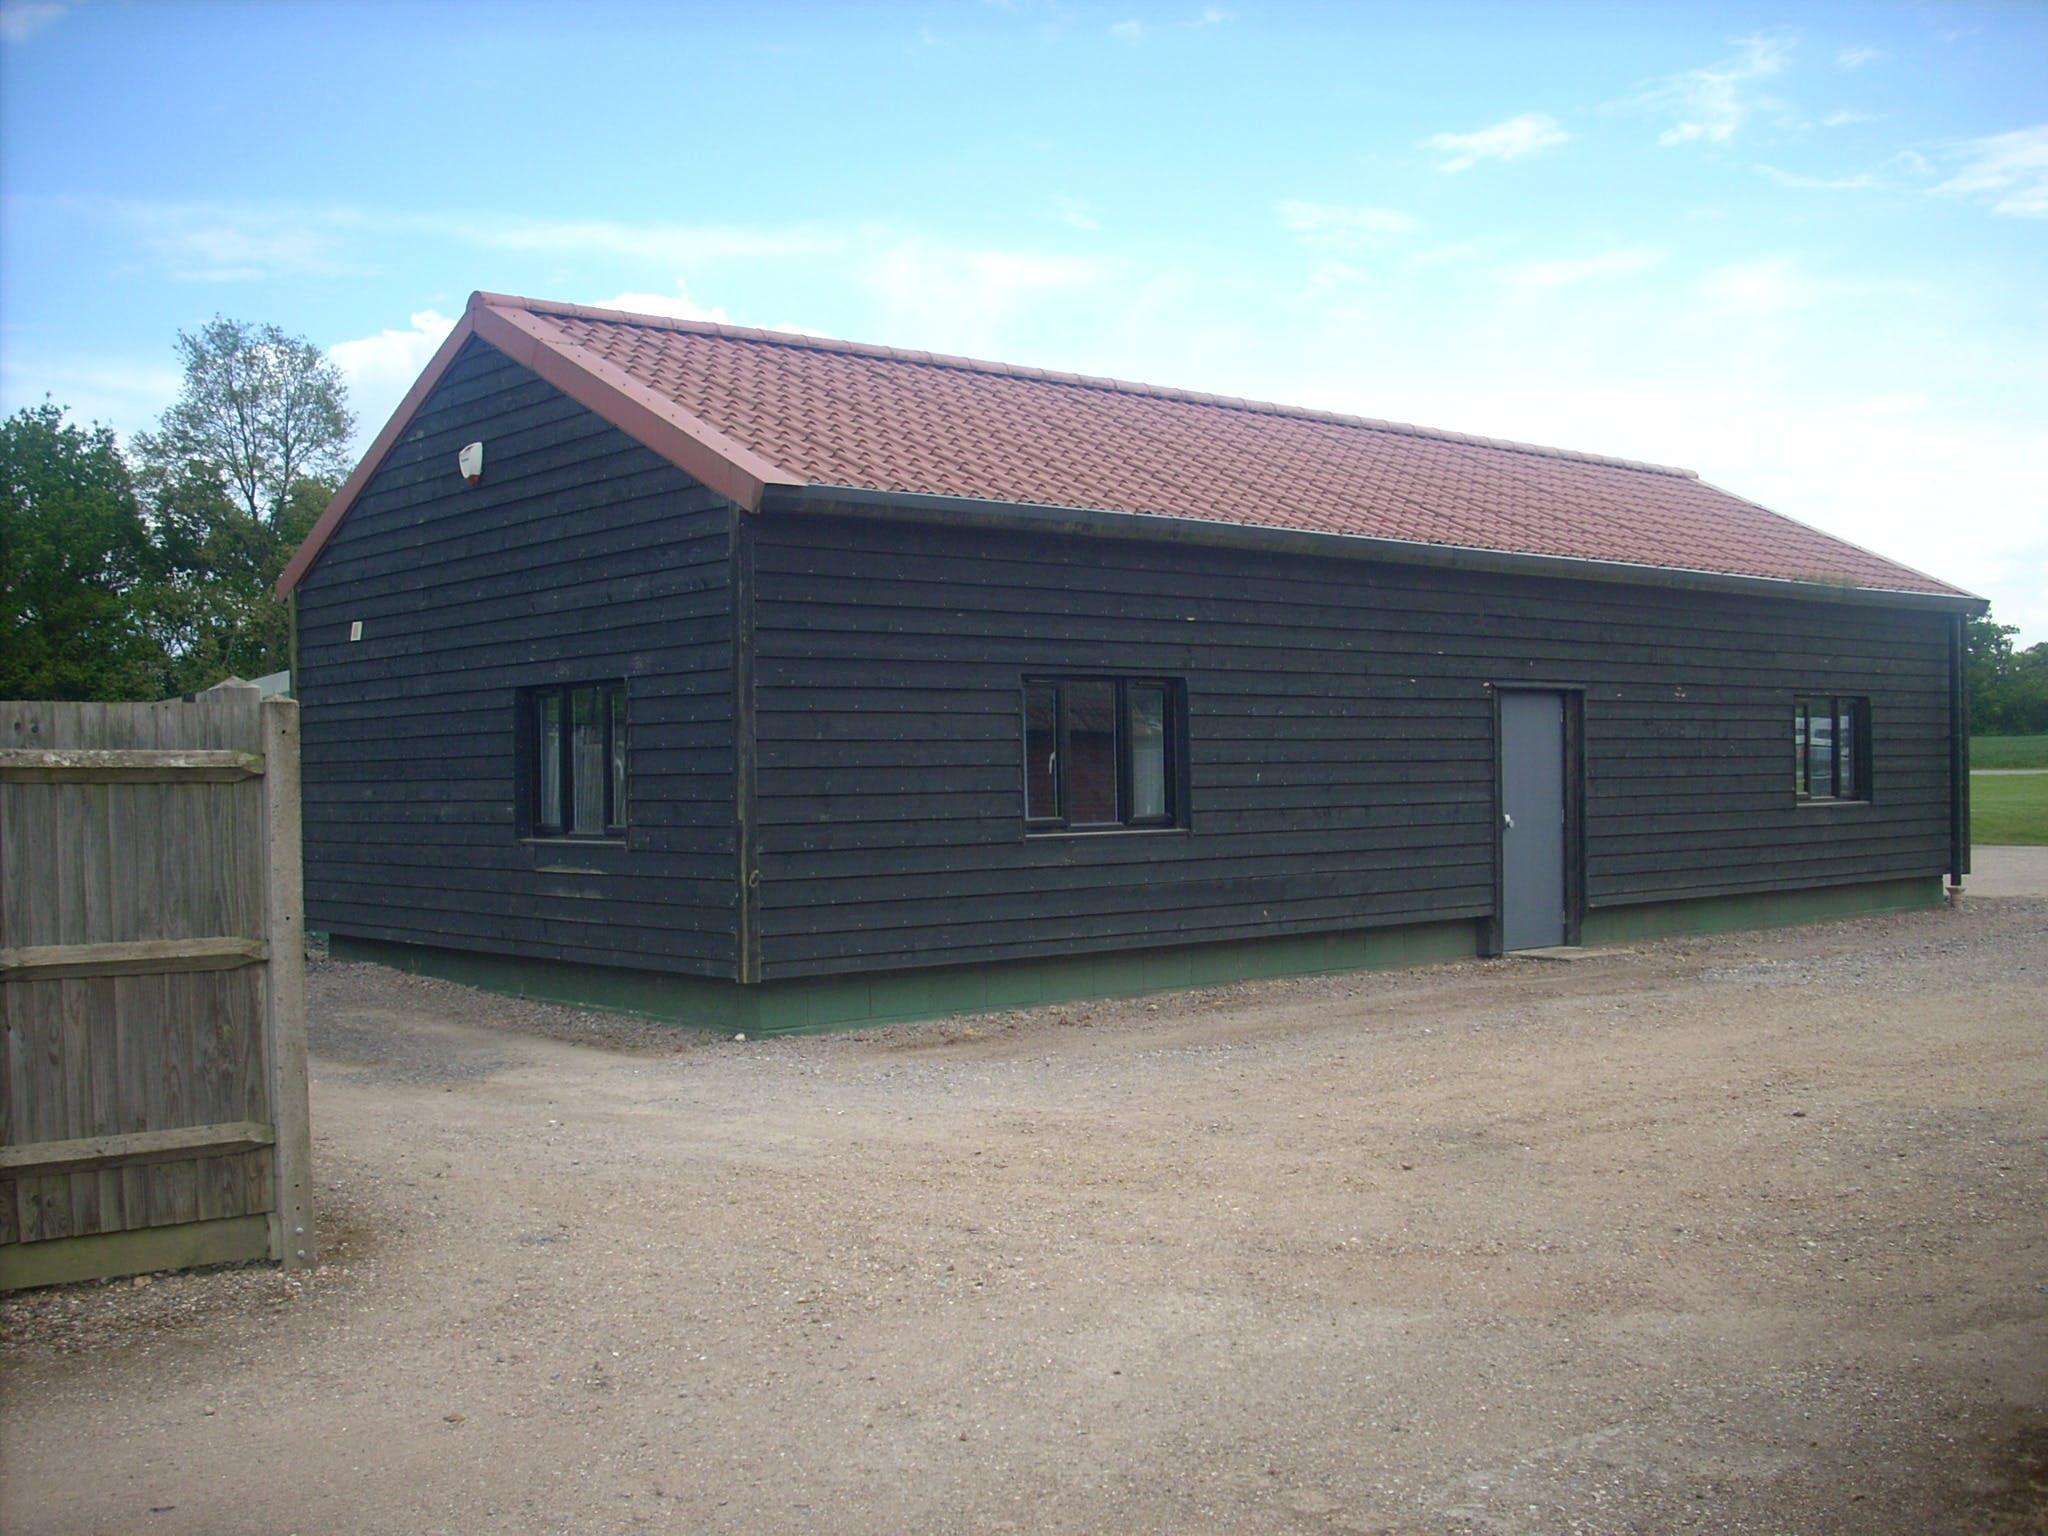 Unit 6, Wyvols Court Farm, Reading, Offices To Let - 6 Wyvols Court external 1.JPG